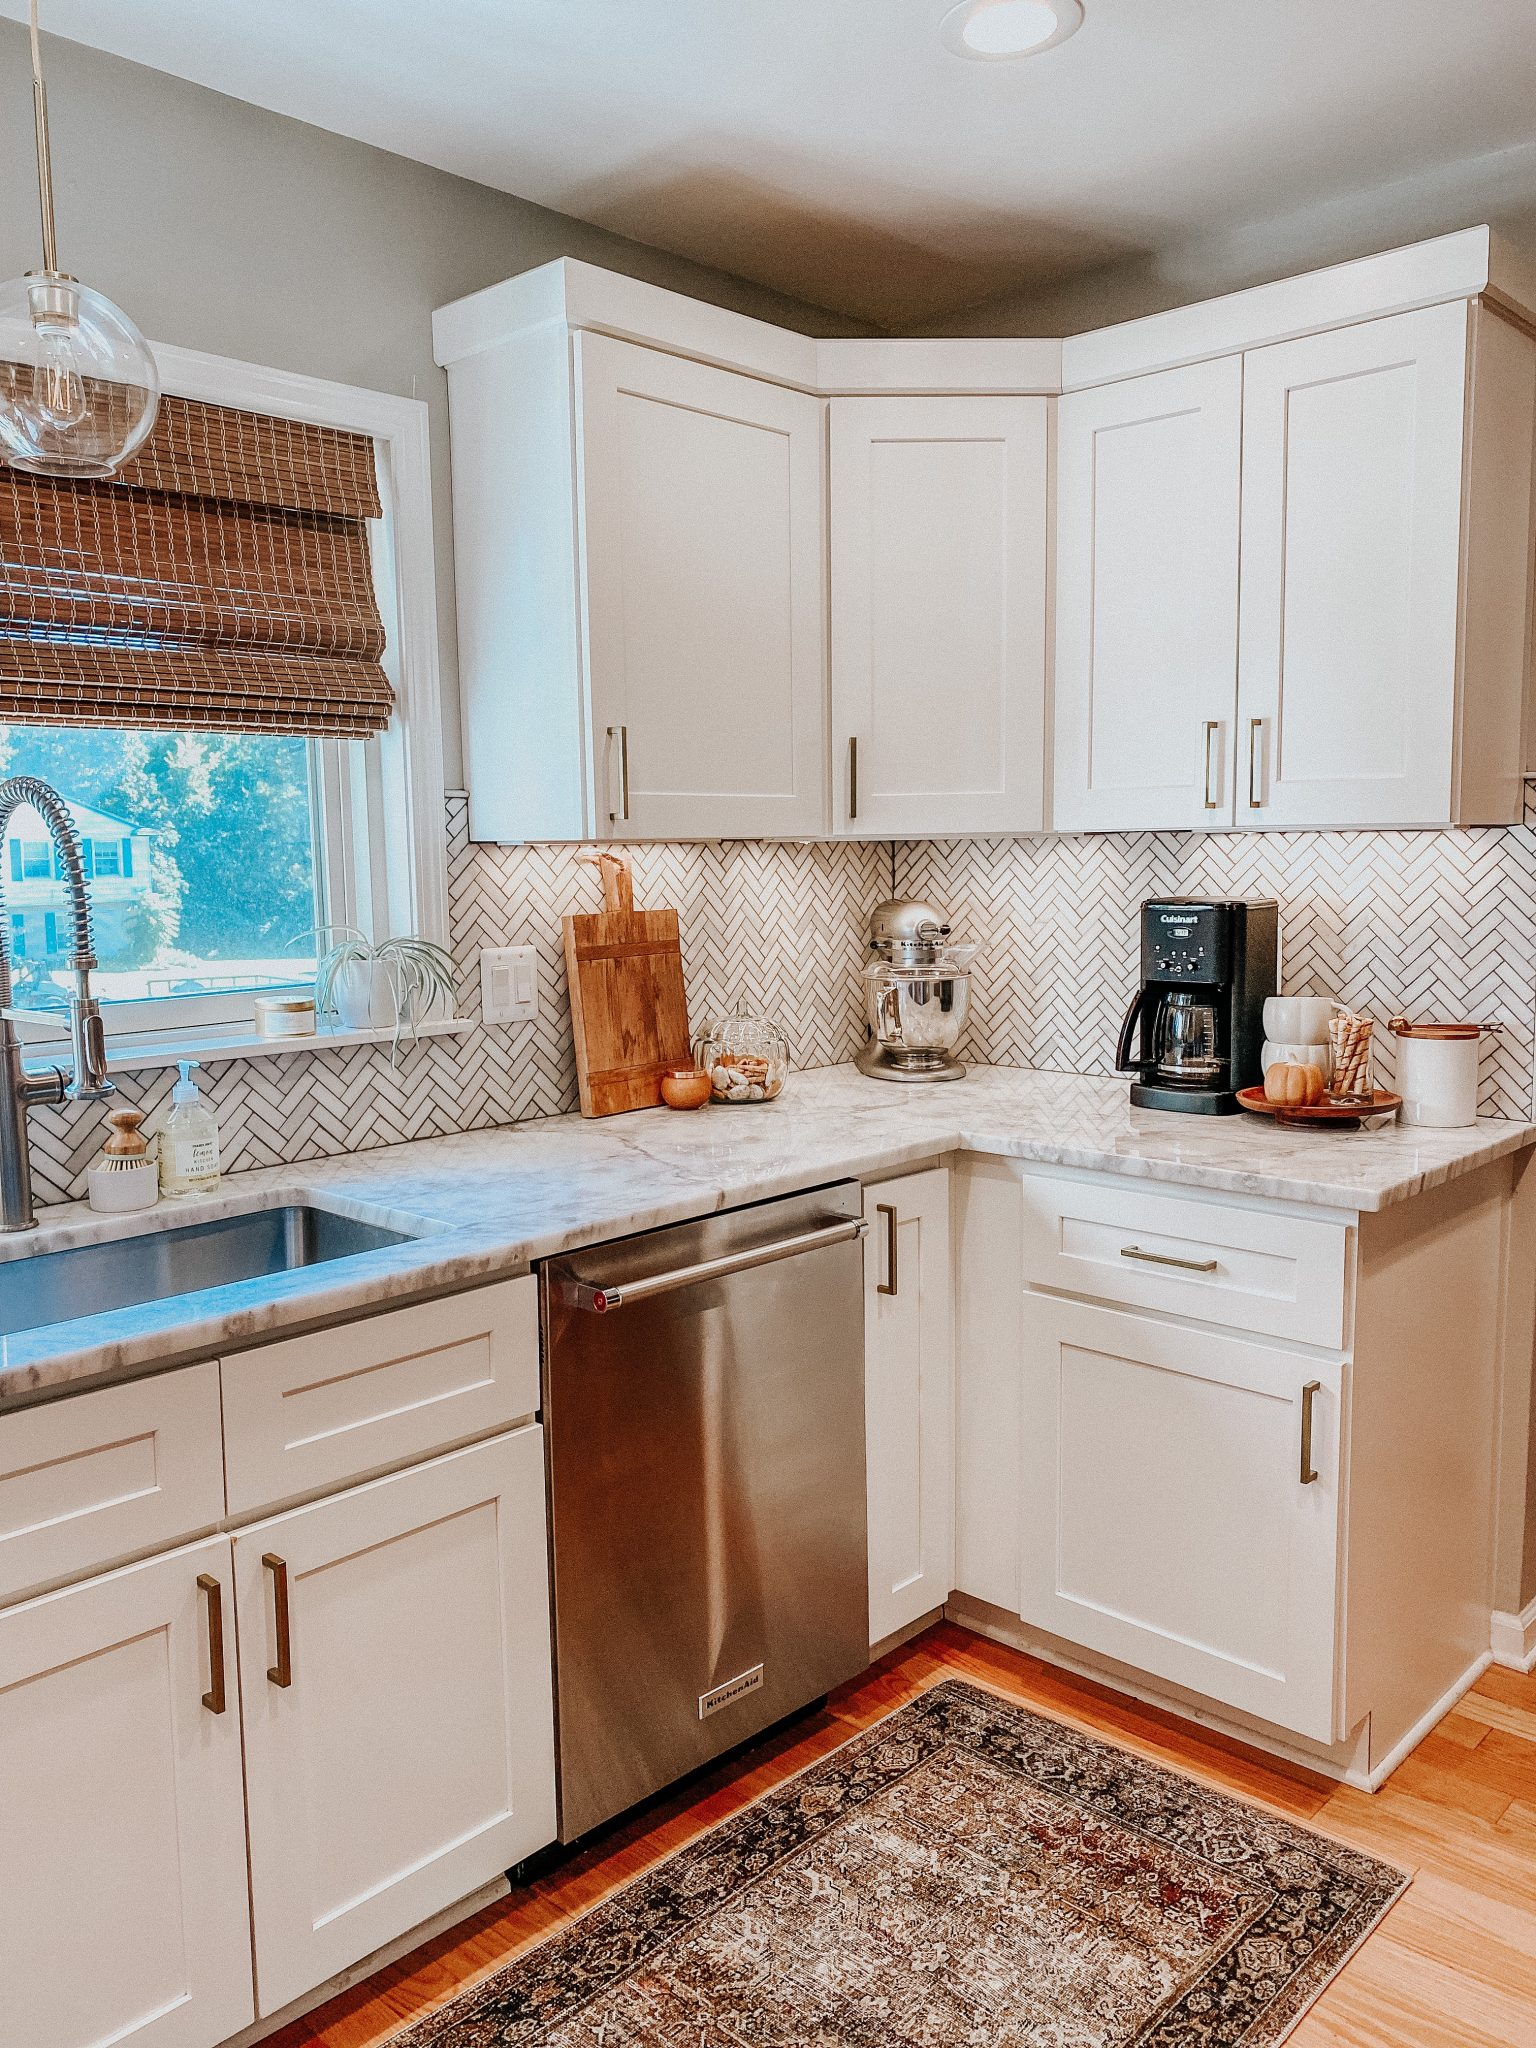 Easy ways to change up a room | Daily Splendor Home and Style Blog | kitchen pendant #kitchendesign #kitchendecor #modernorganic #tranistiondesign #bambooshade #whitecabinets #globependant #falldecor #fallkitchen